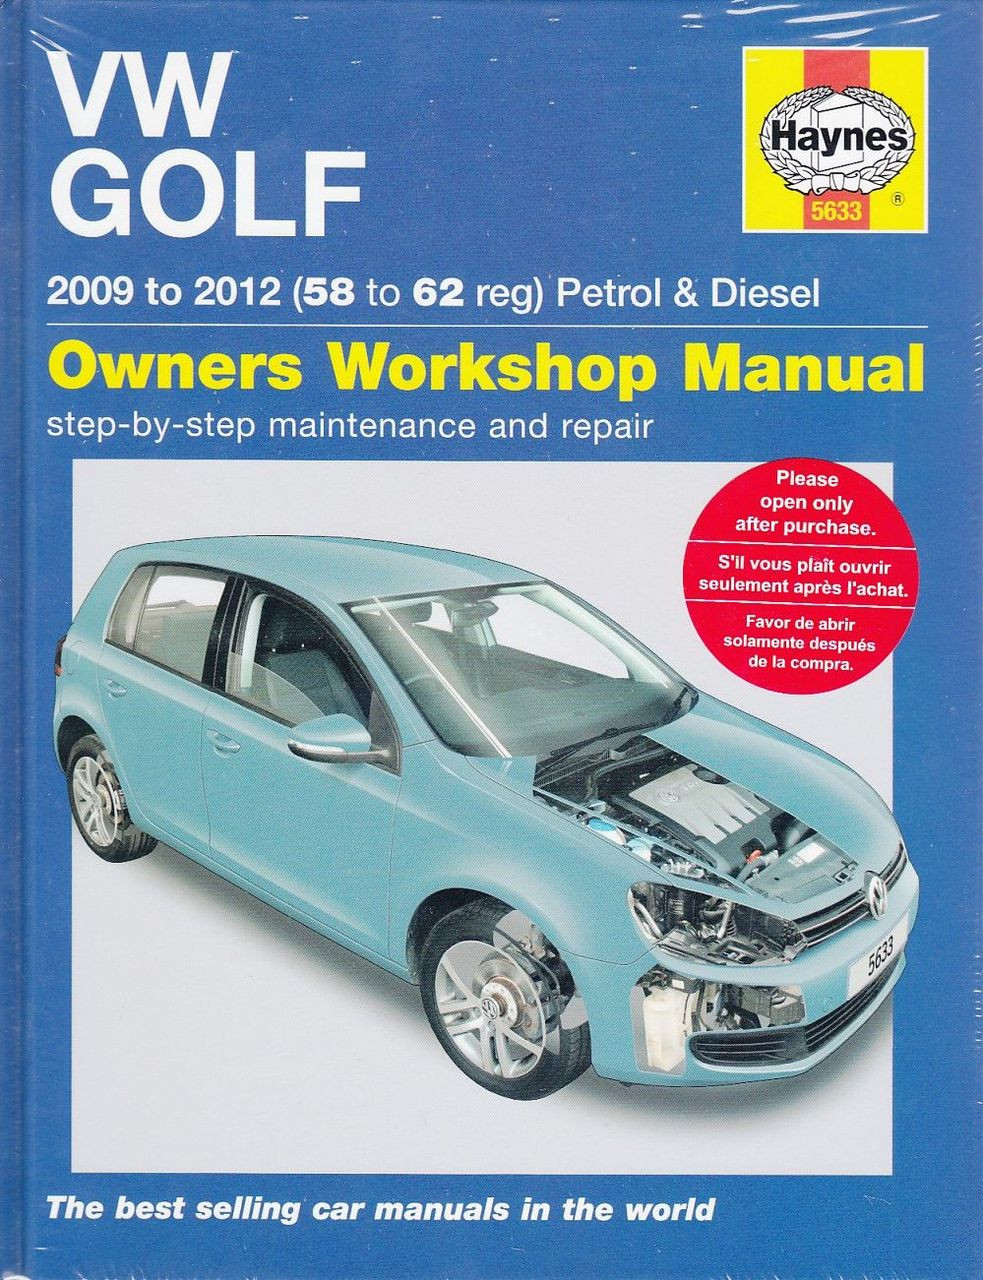 vw golf 2009 2012 petrol diesel repair manual rh automotobookshop com au Polo TDI 2000 Volkswagen Polo GT TDI